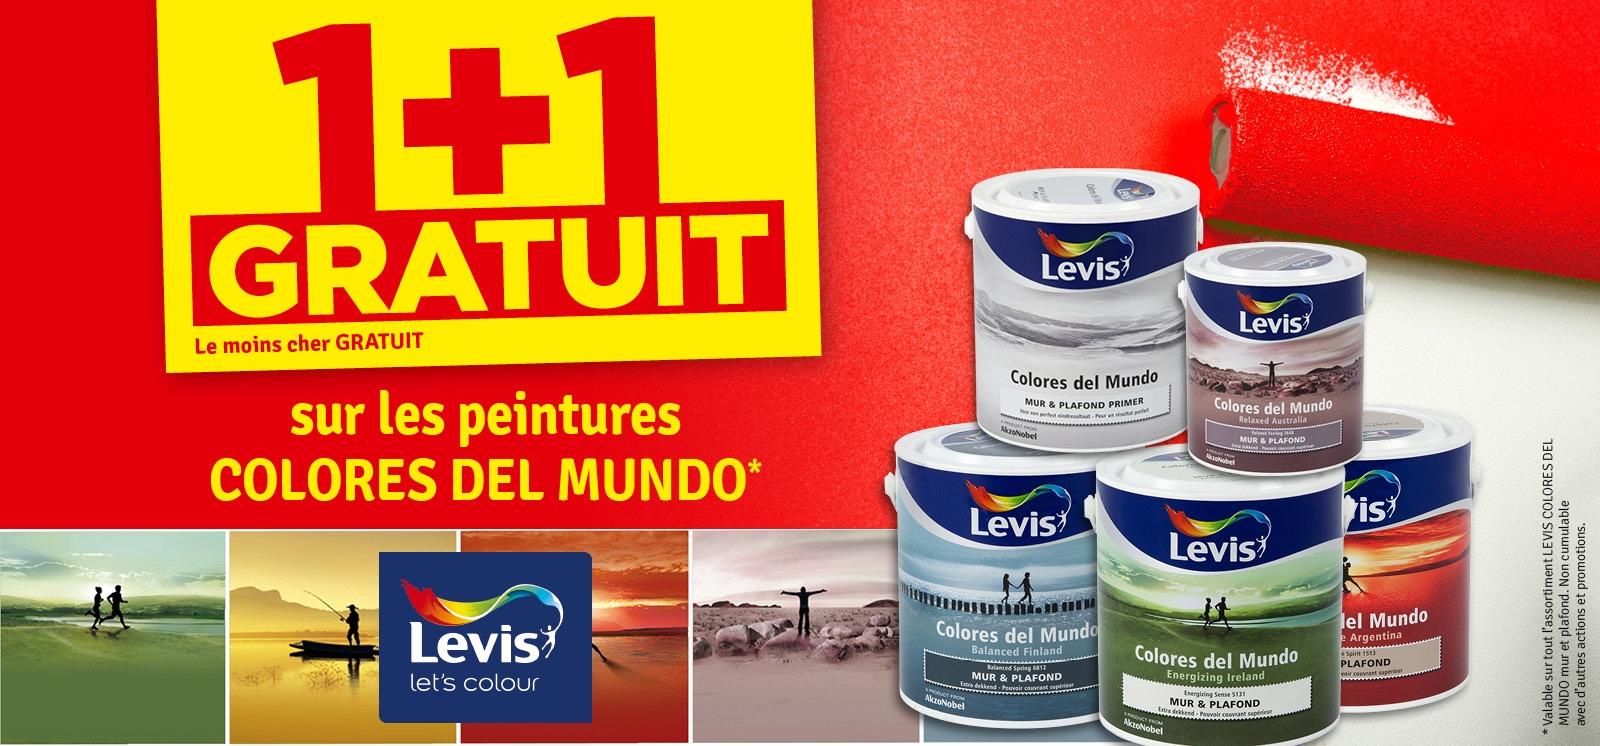 Promo - Peinture Colores Del Mundo LEVIS 1 + 1 gratuit